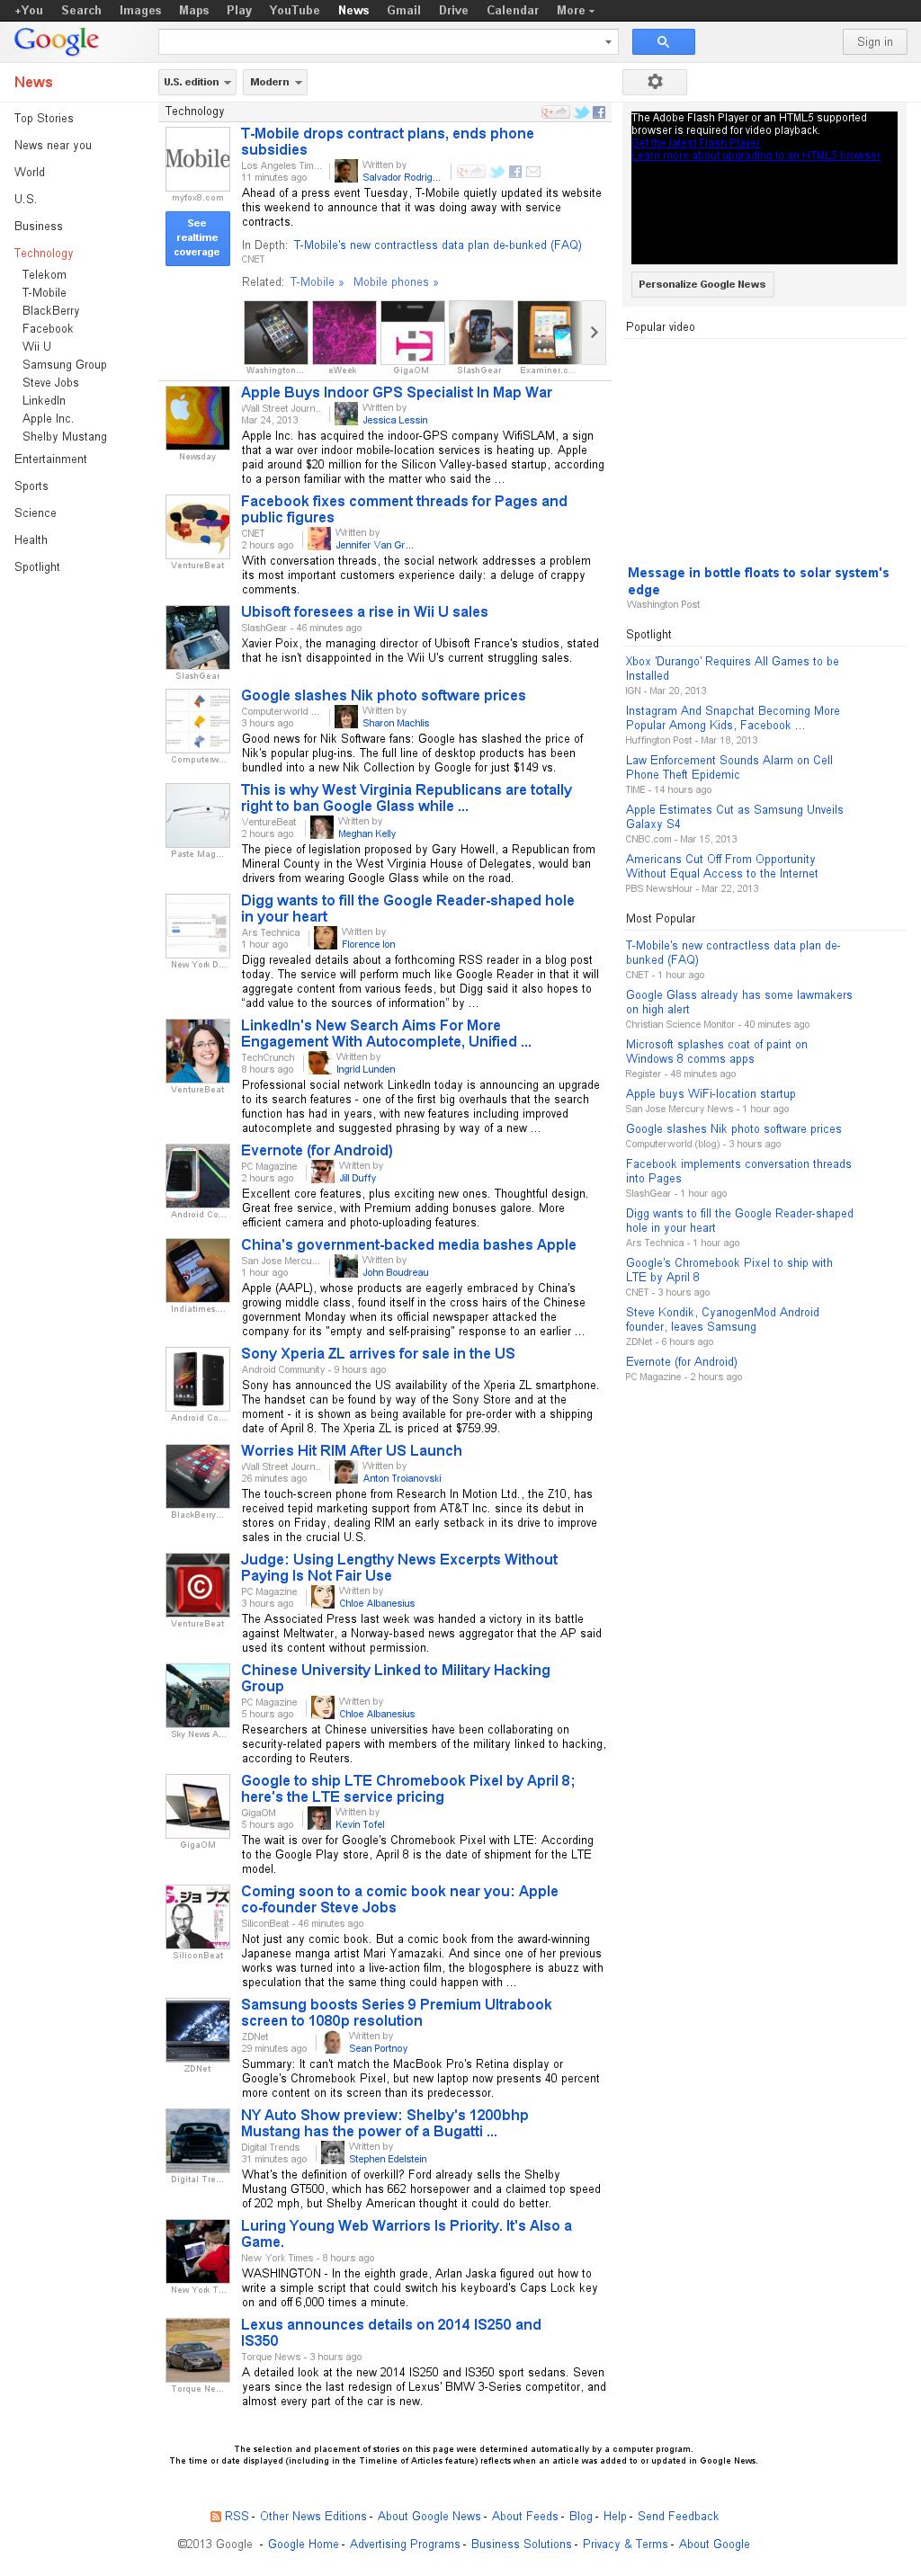 Google News: Technology at Tuesday March 26, 2013, 12:16 a.m. UTC